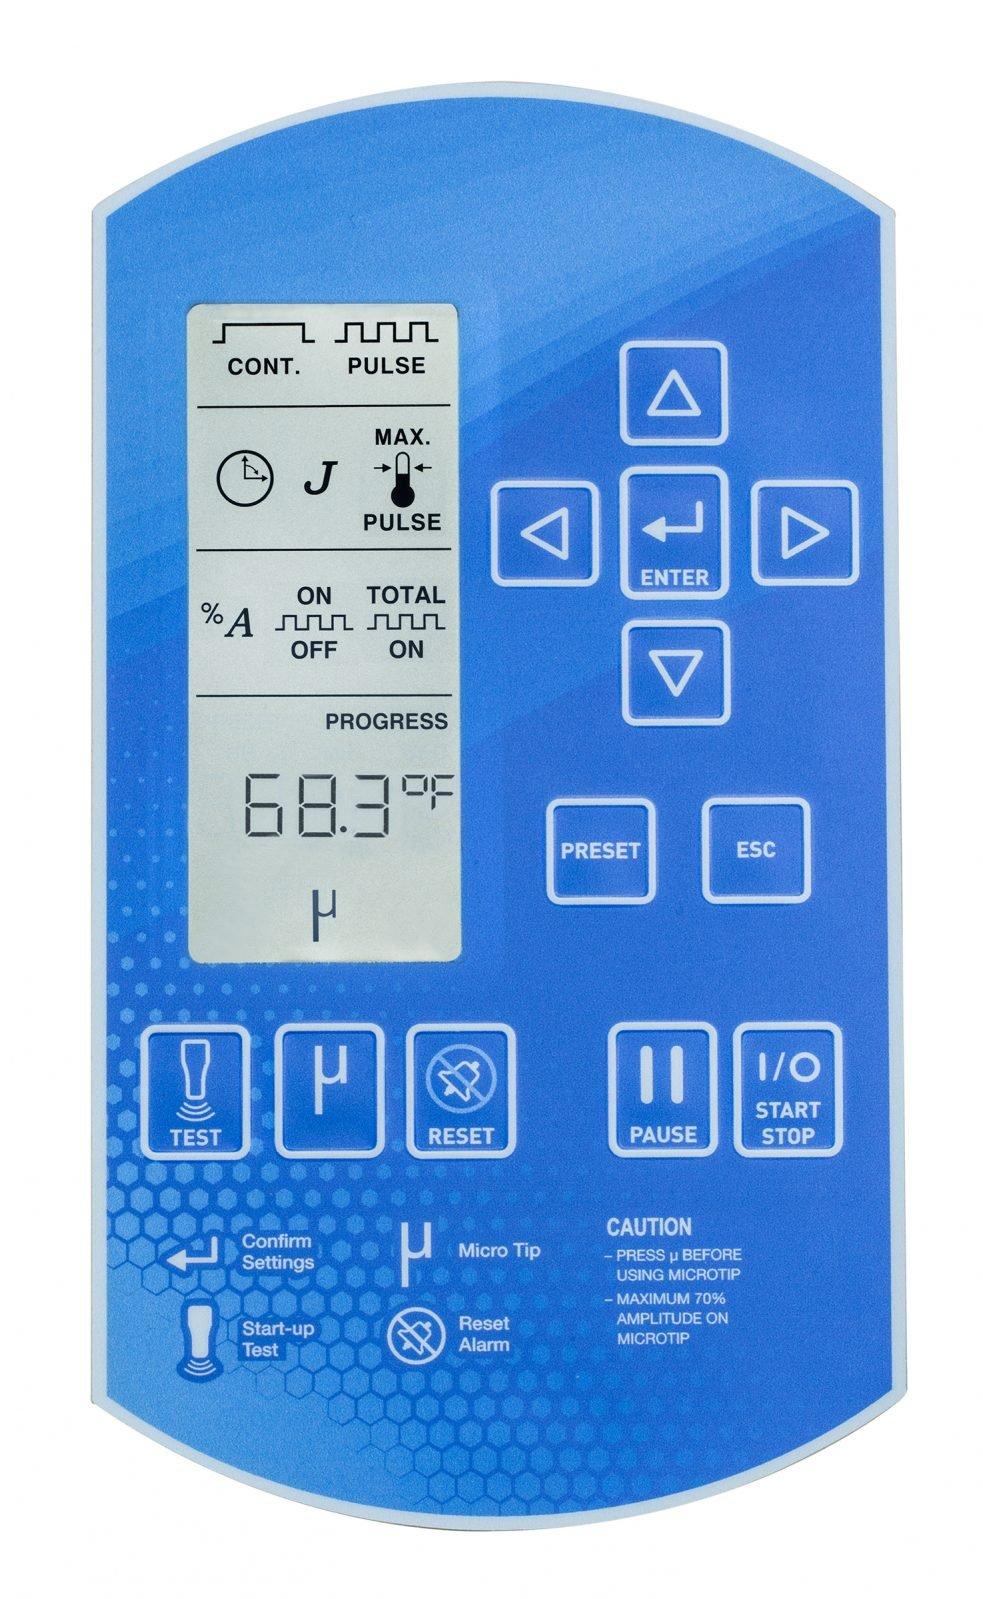 SFX550 Control Panel